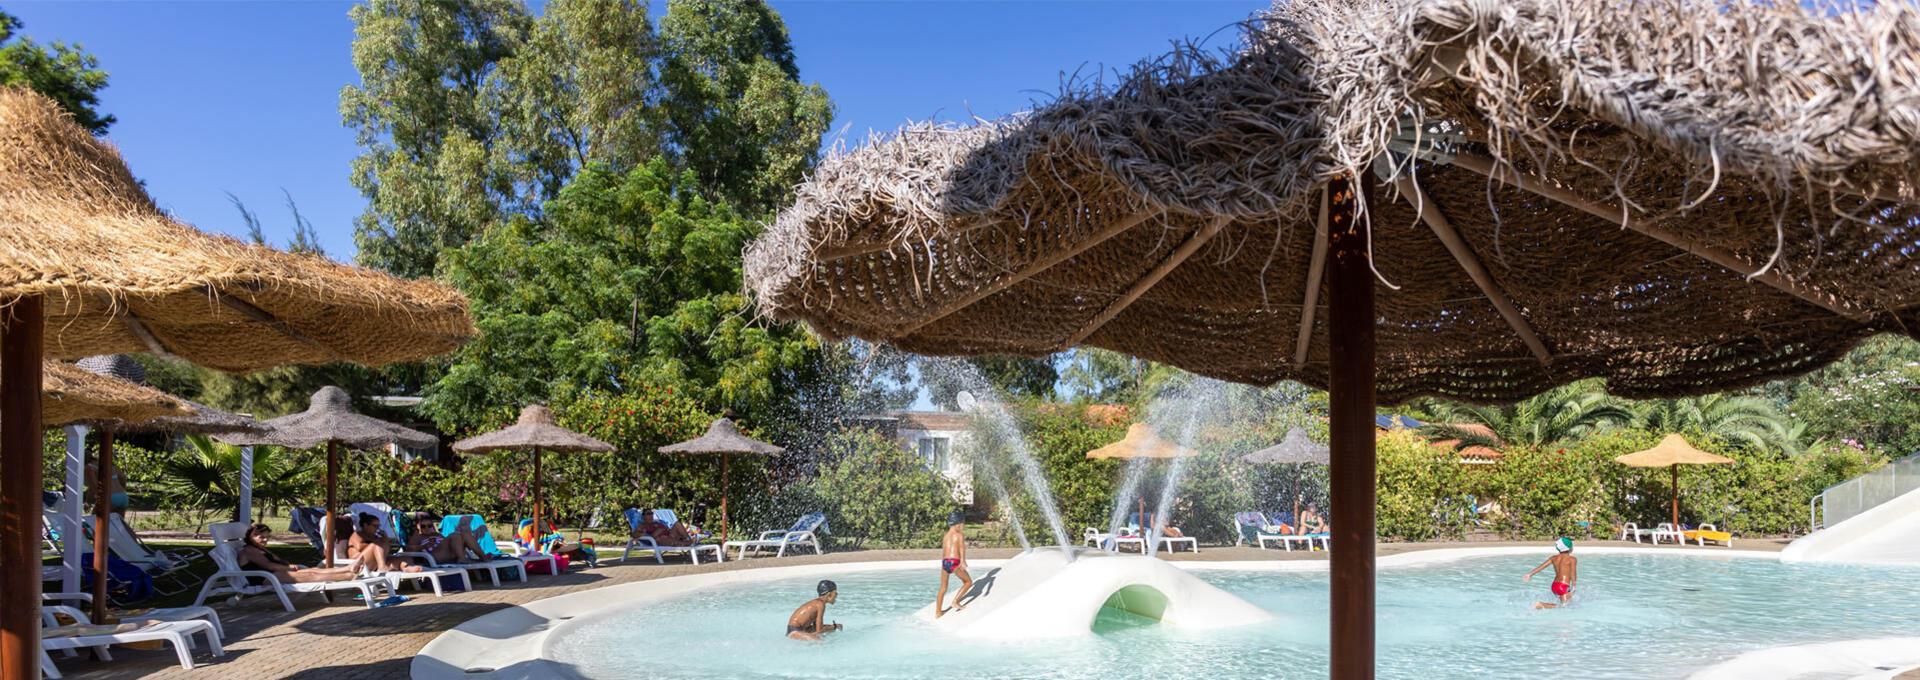 4mori fr village-touristique-avec-piscine-sardaigne 018